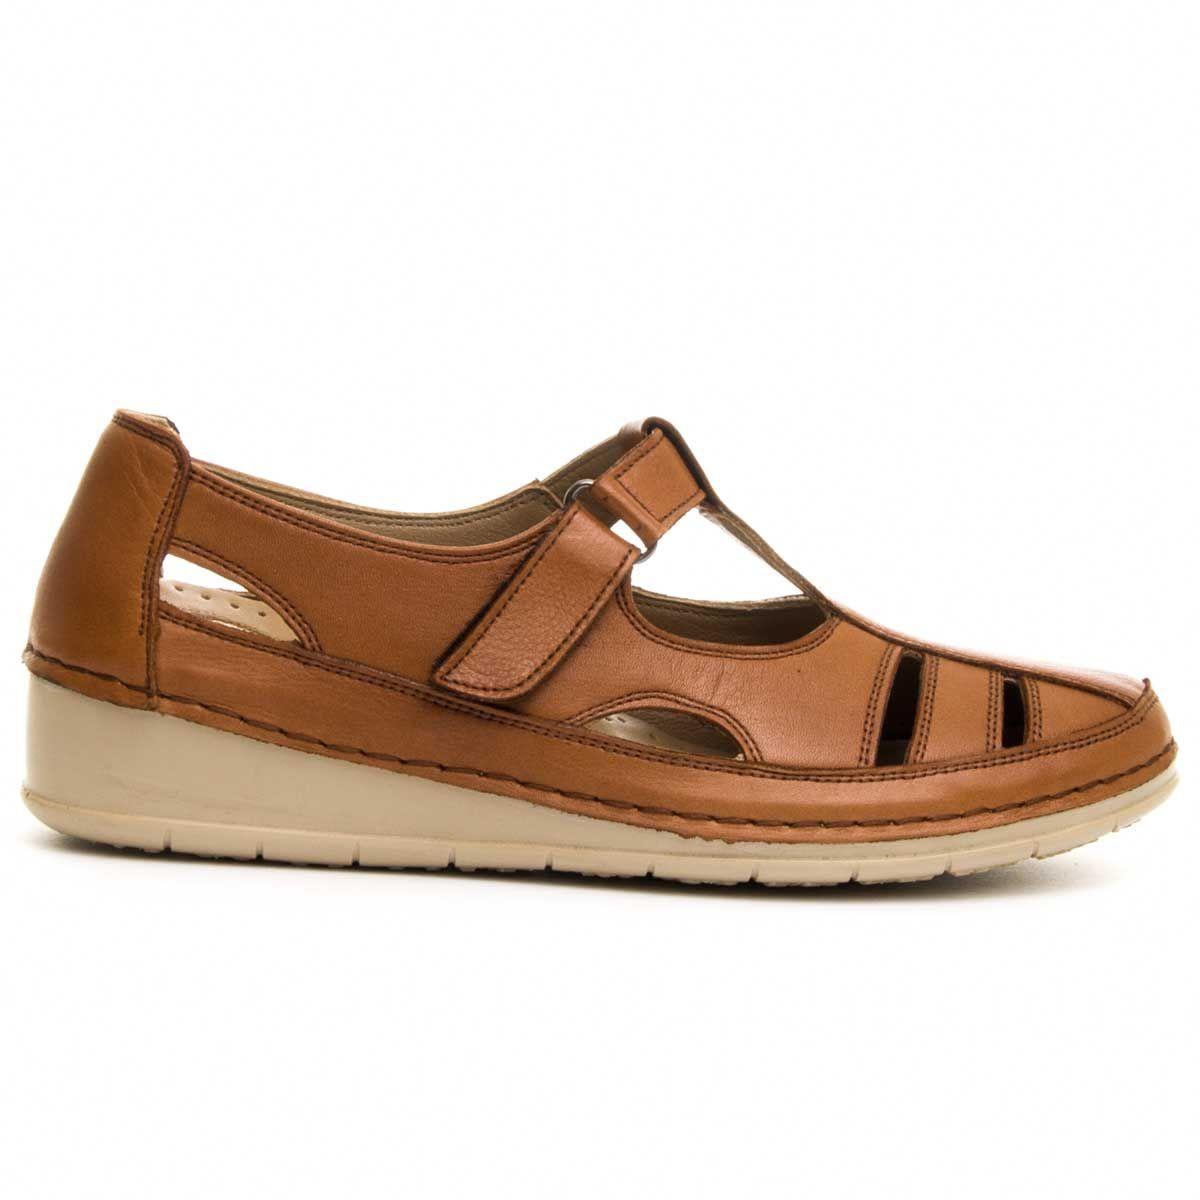 Purapiel Comfortable Sandal in Camel